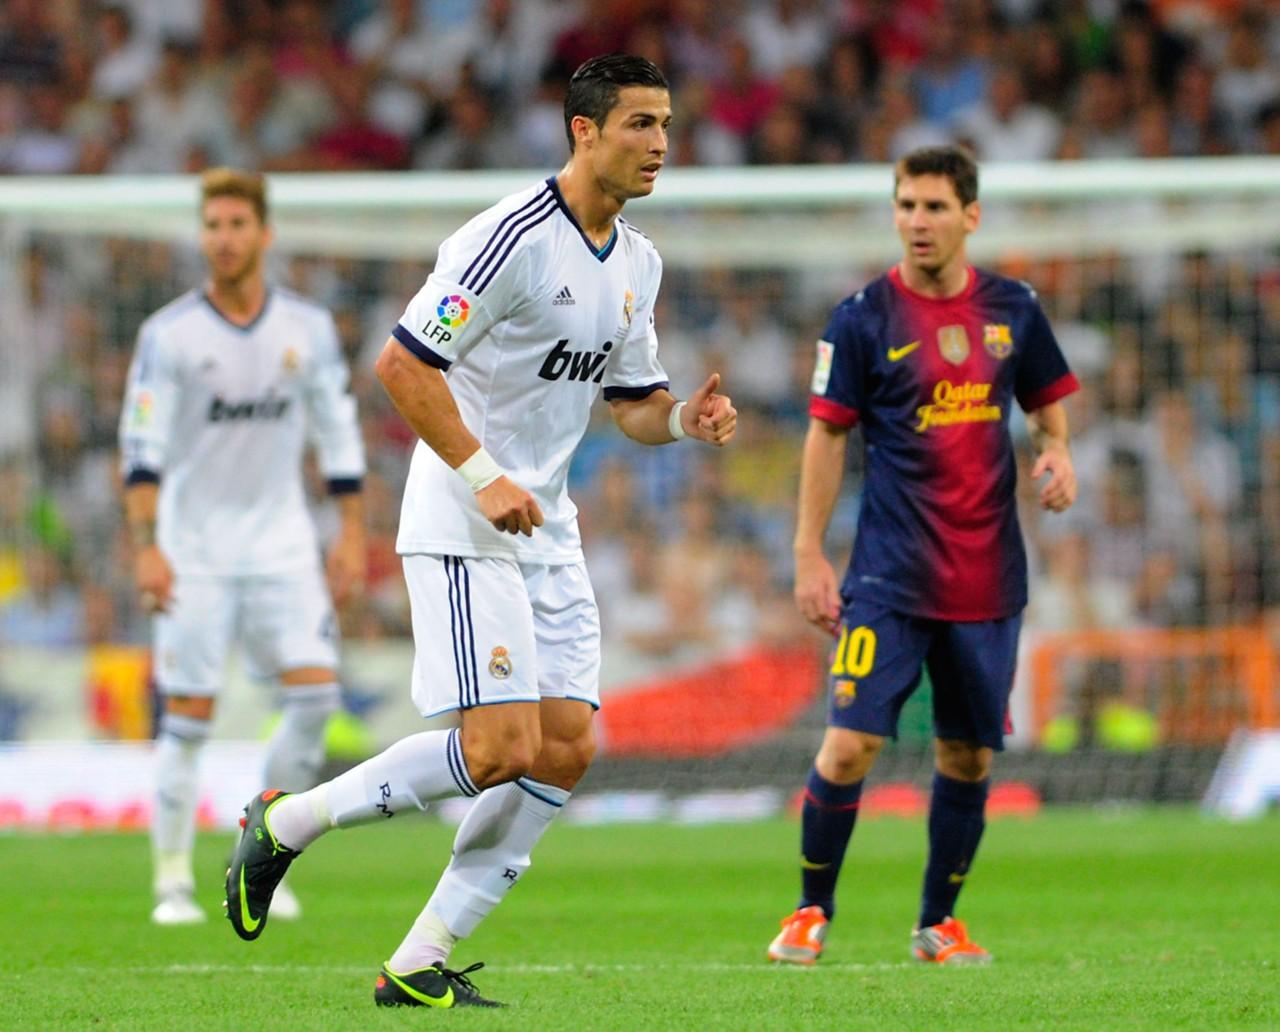 Real Madrid 2 x 1 Barcelona - Gonzalo Arroyo Moreno/Getty Images